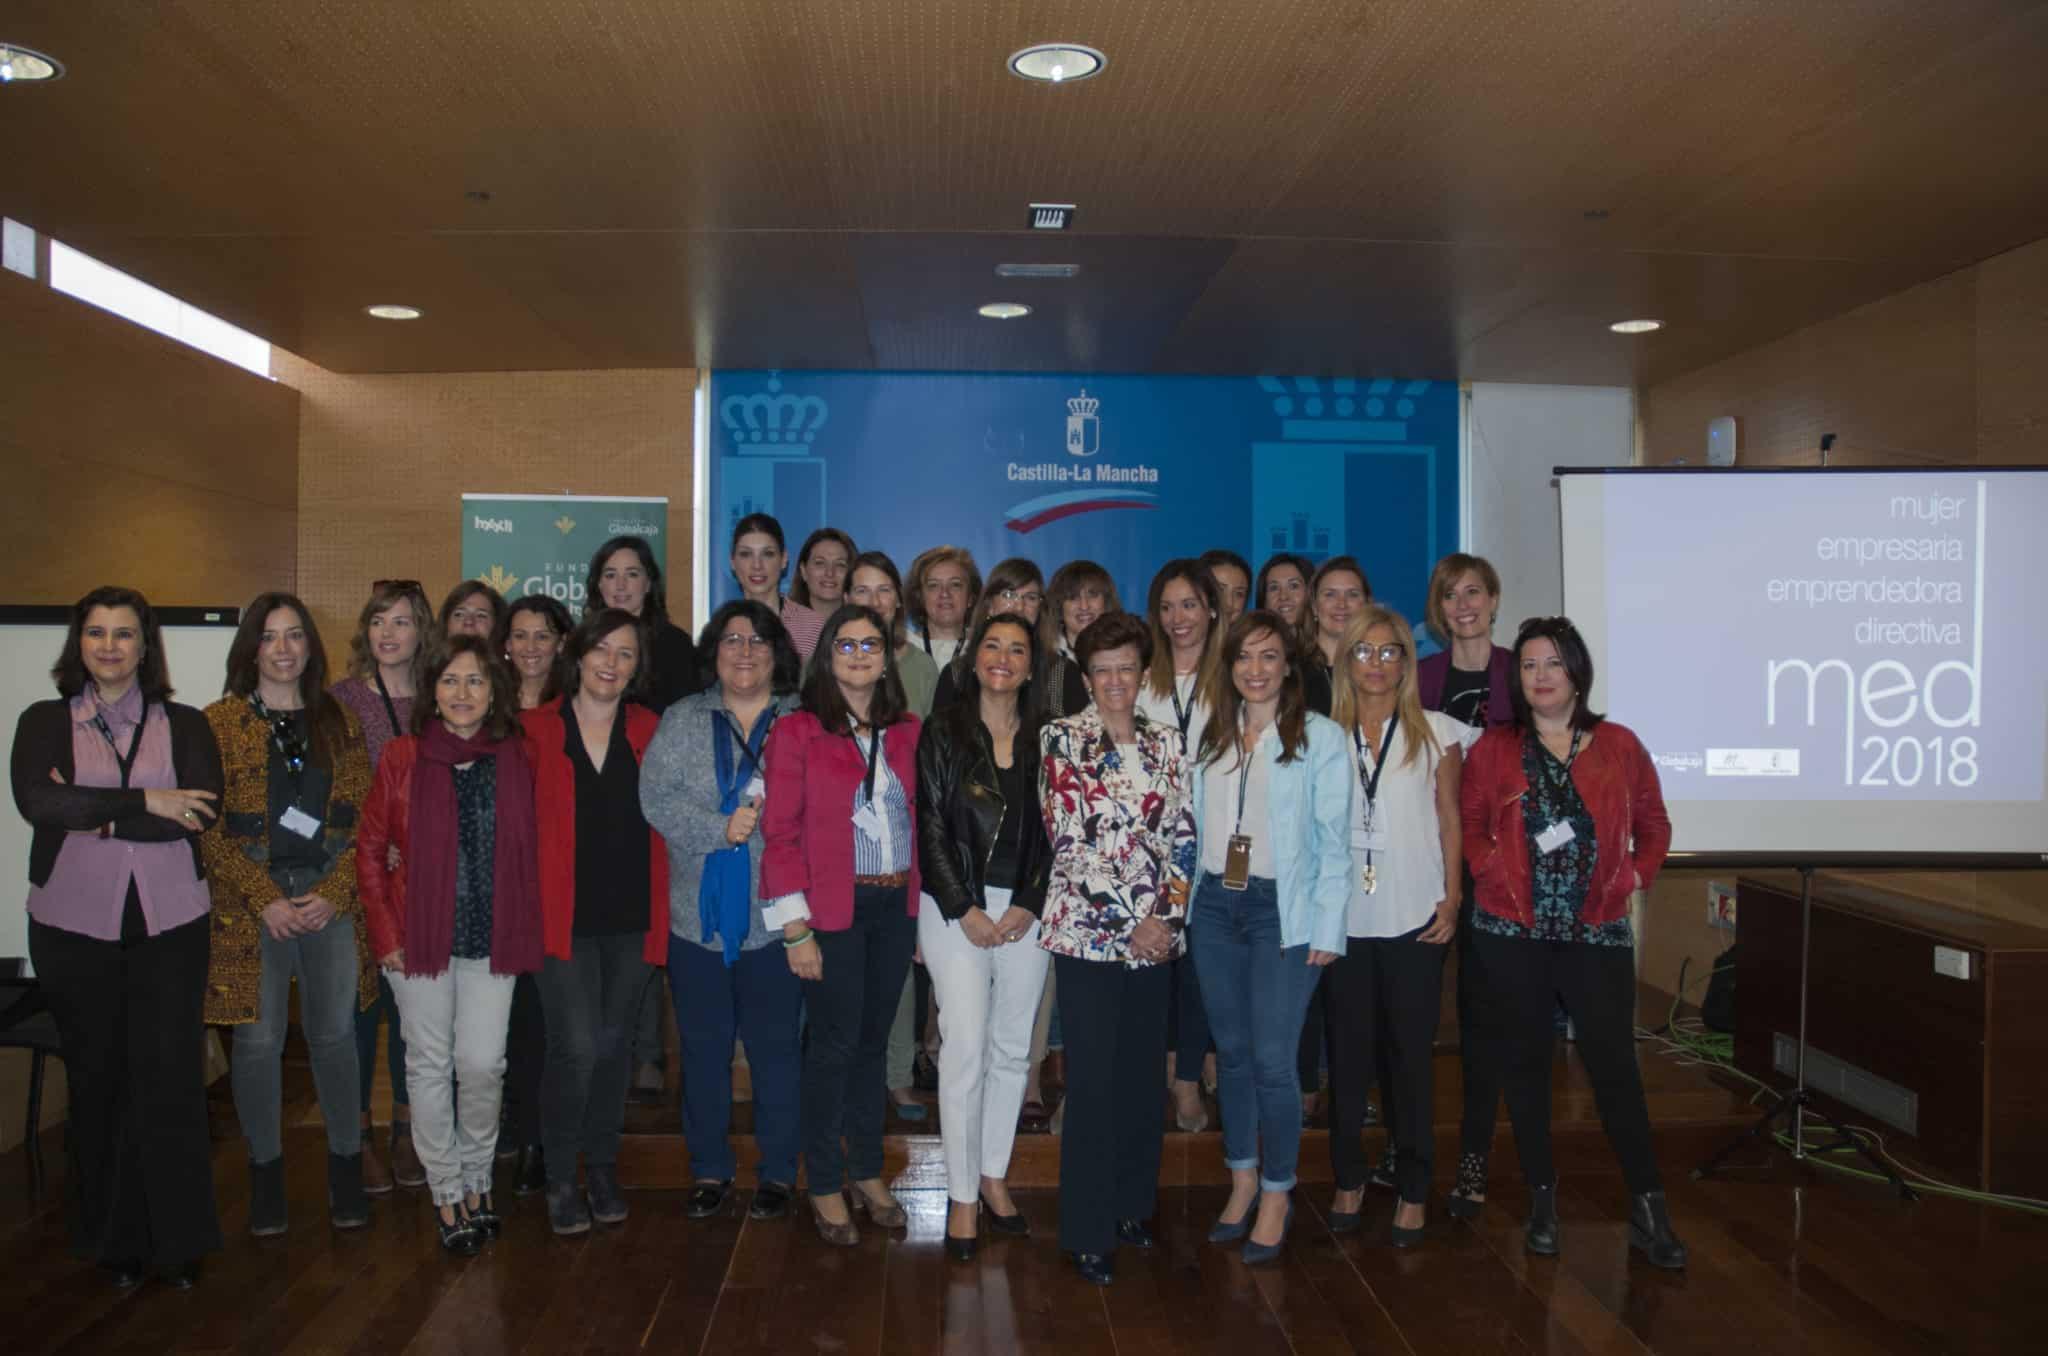 https://blog.globalcaja.es/wp-content/uploads/2018/05/MED-Inauguracion-grupo.jpg